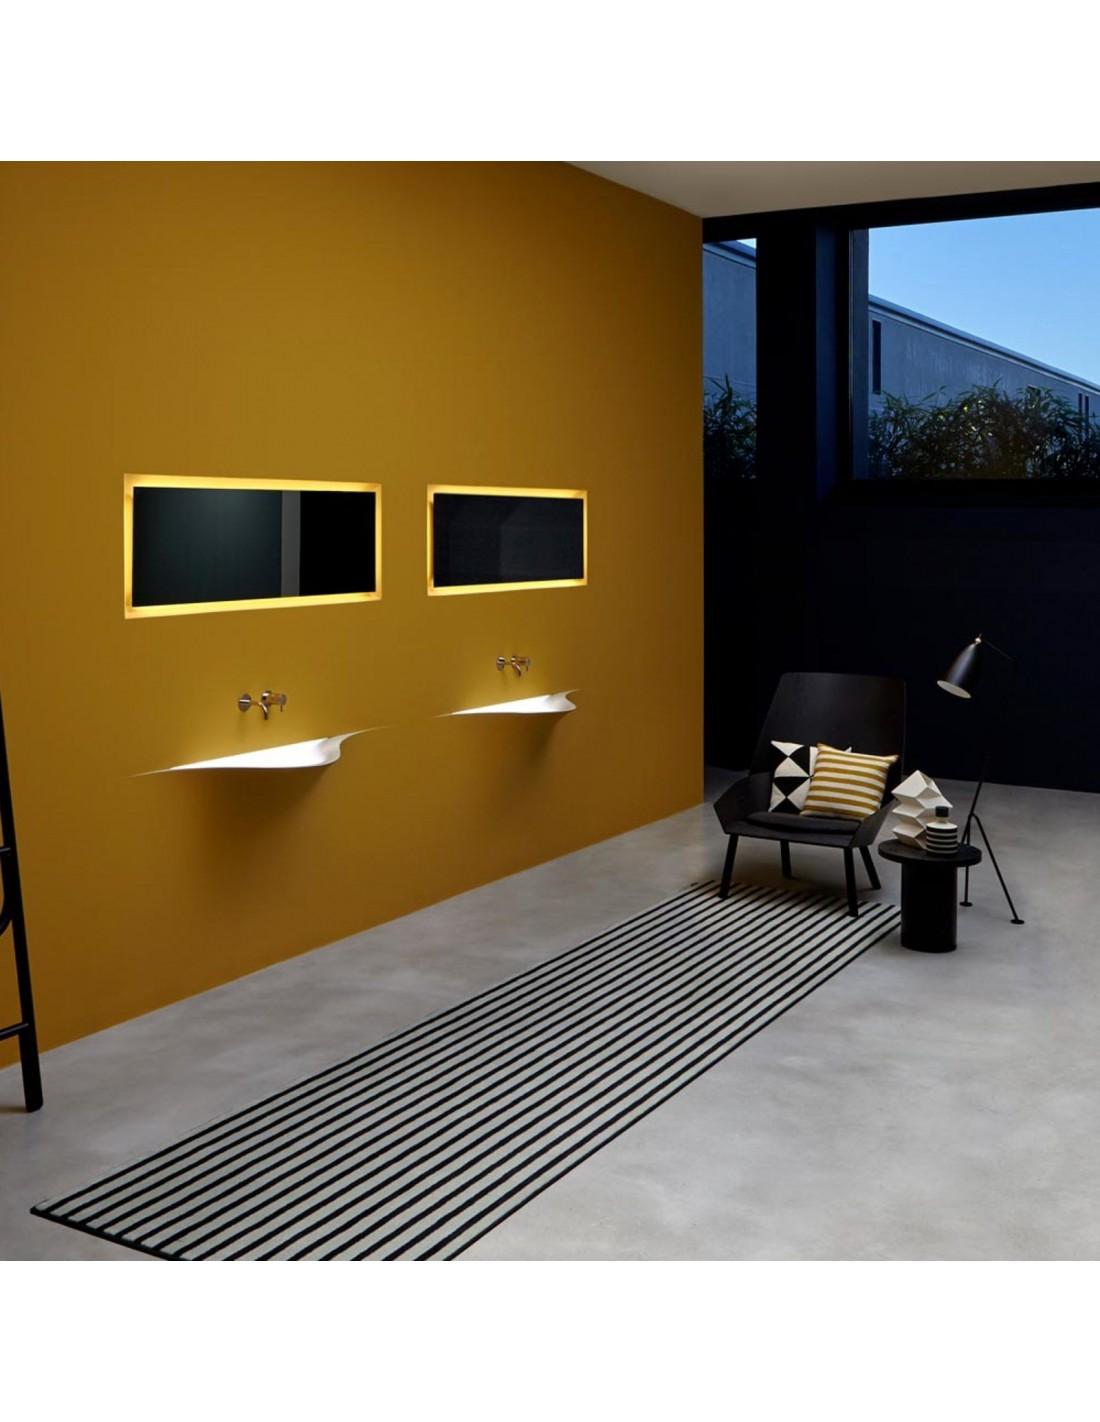 Vasque design silenzio LED dans une chambre par la marque Antonio Lupi - Valente Design